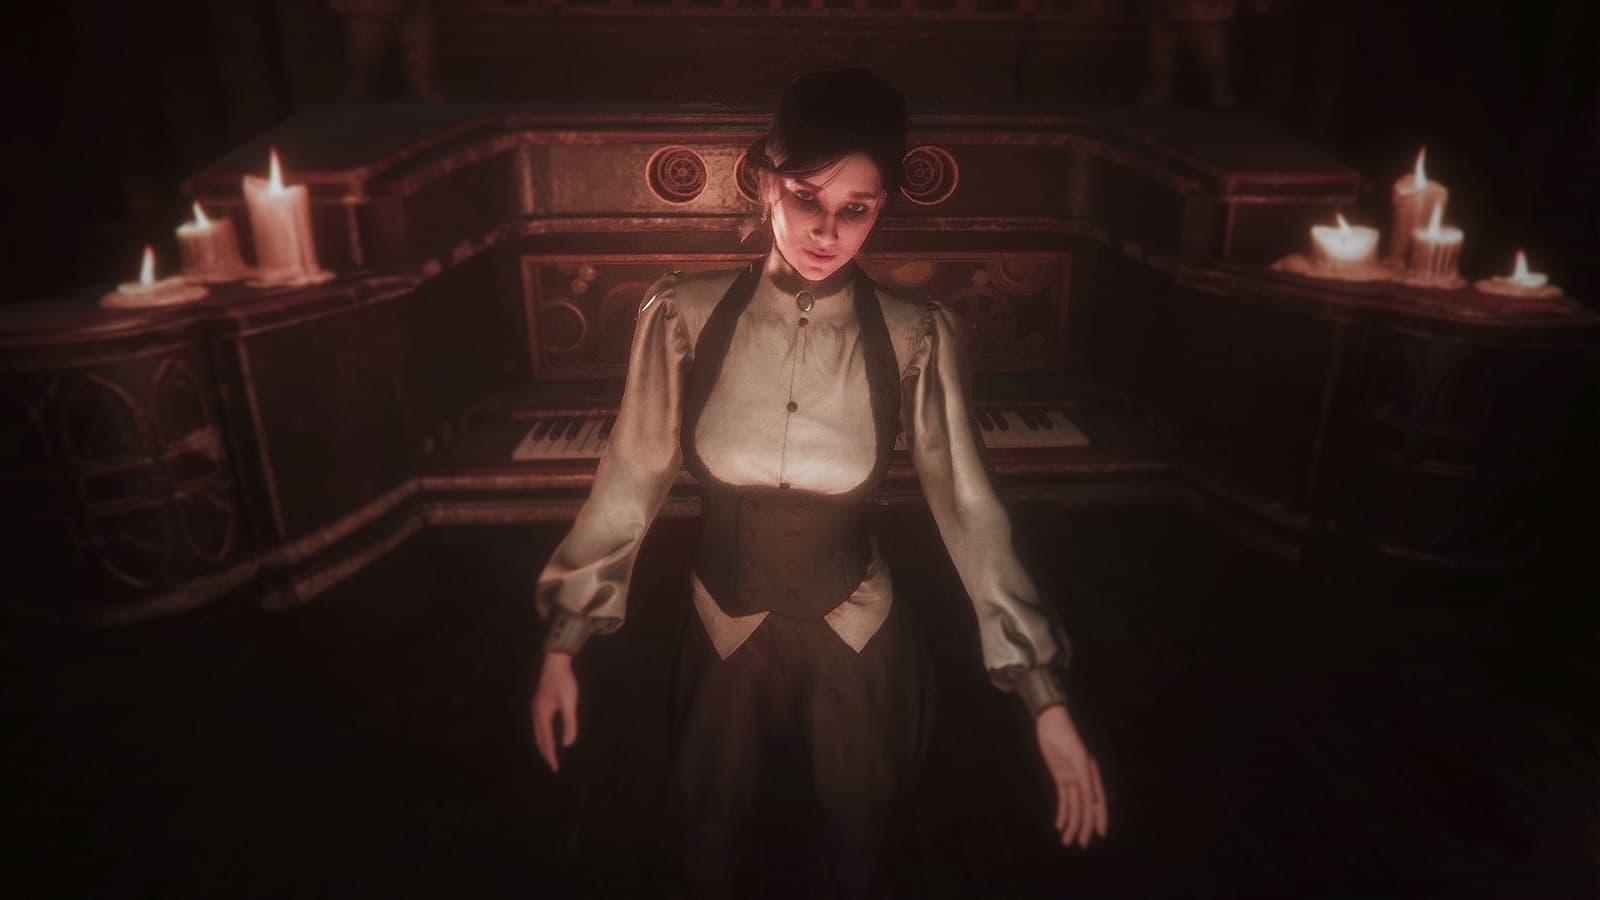 Рецензия на игру Maid of Sker - готический клон ремейка Resident Evil 2 с примесью Amnesia - 04